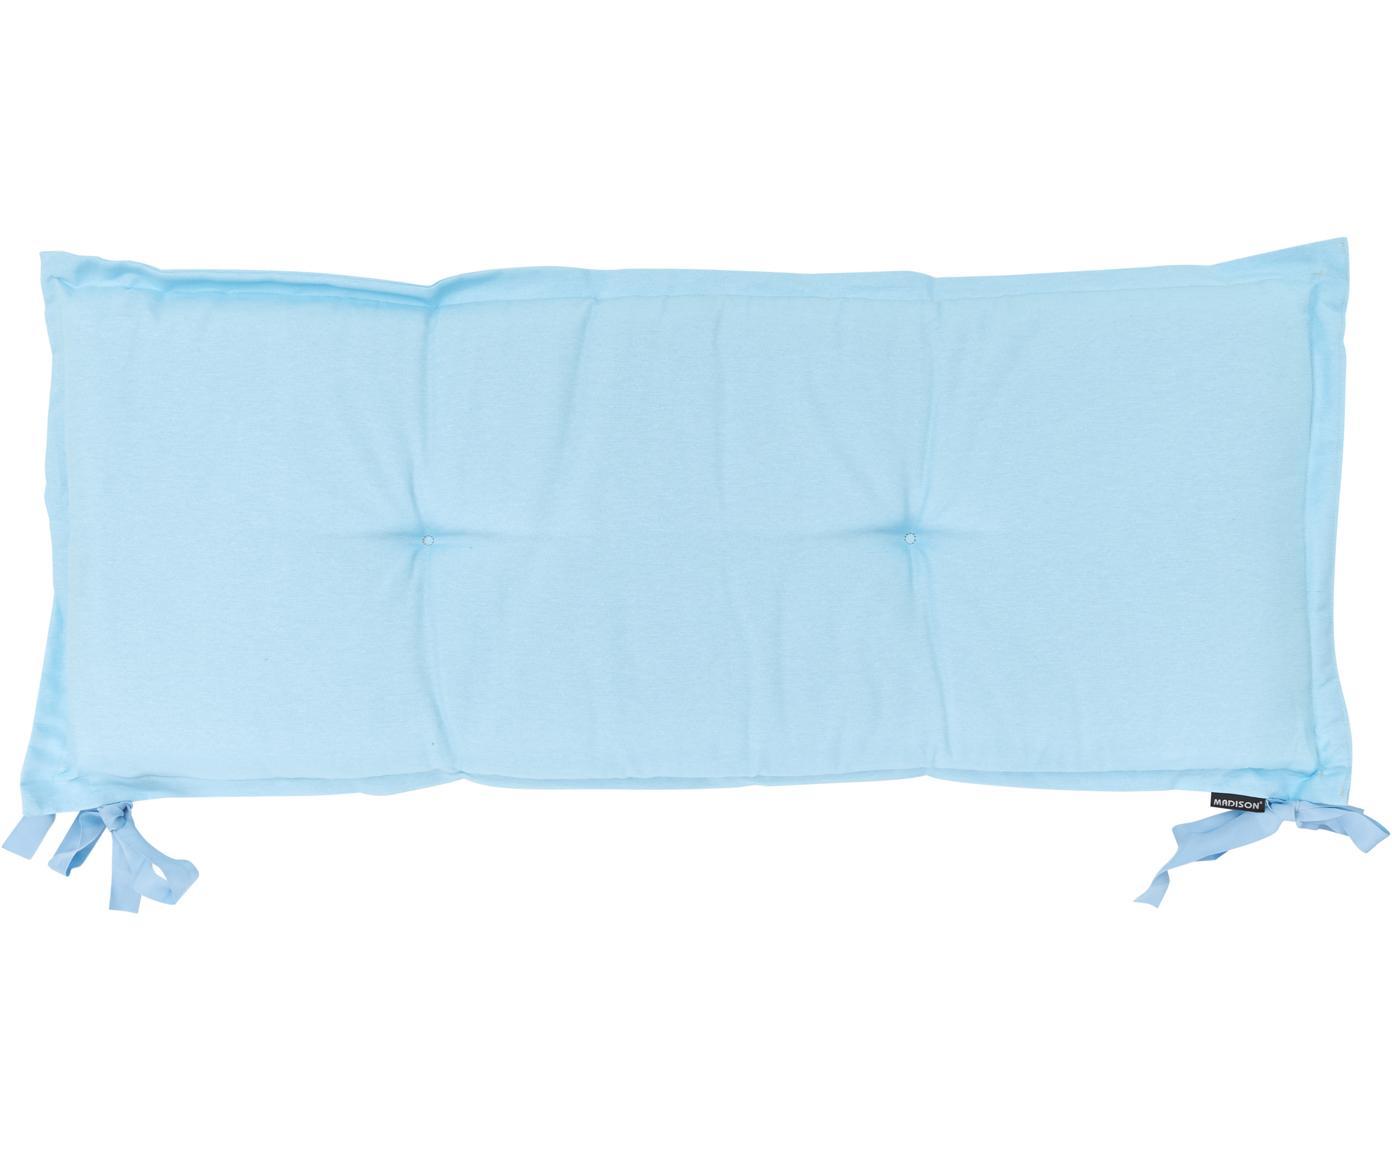 Cojín de banco Panama, Tapizado: 50%algodón, 45%poliéste, Azul claro, An 48 x L 150 cm